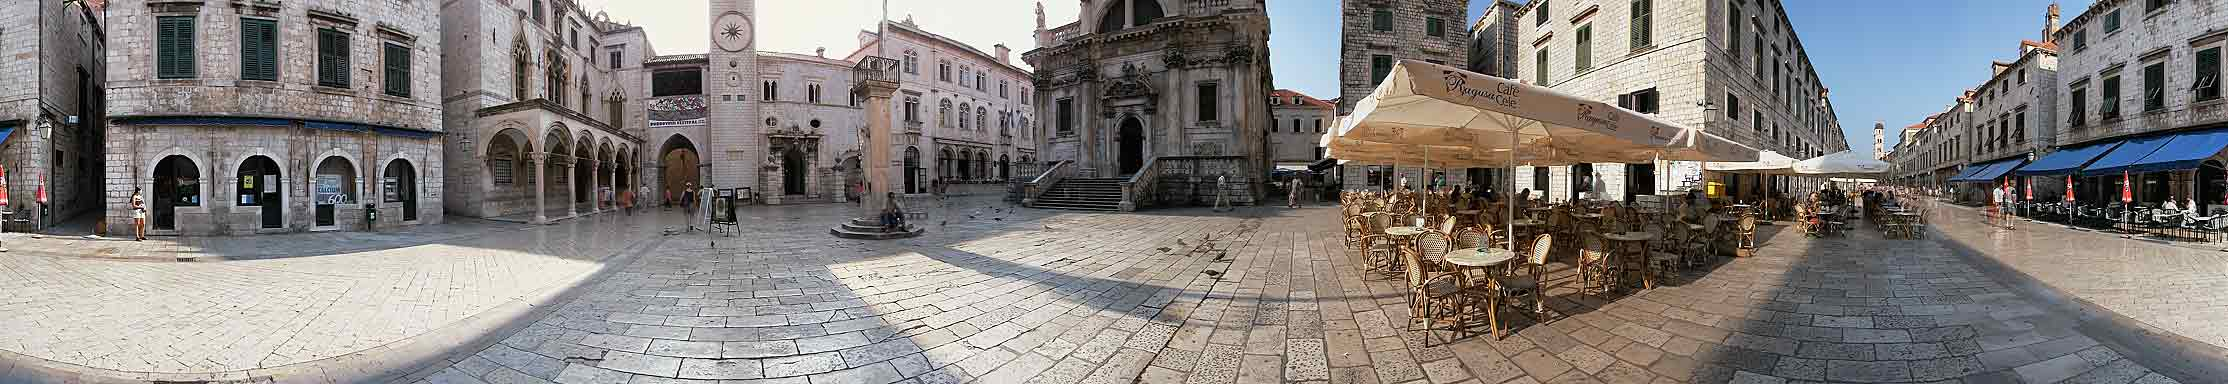 rmation old town virtual tour panorama photos stradun ploce side